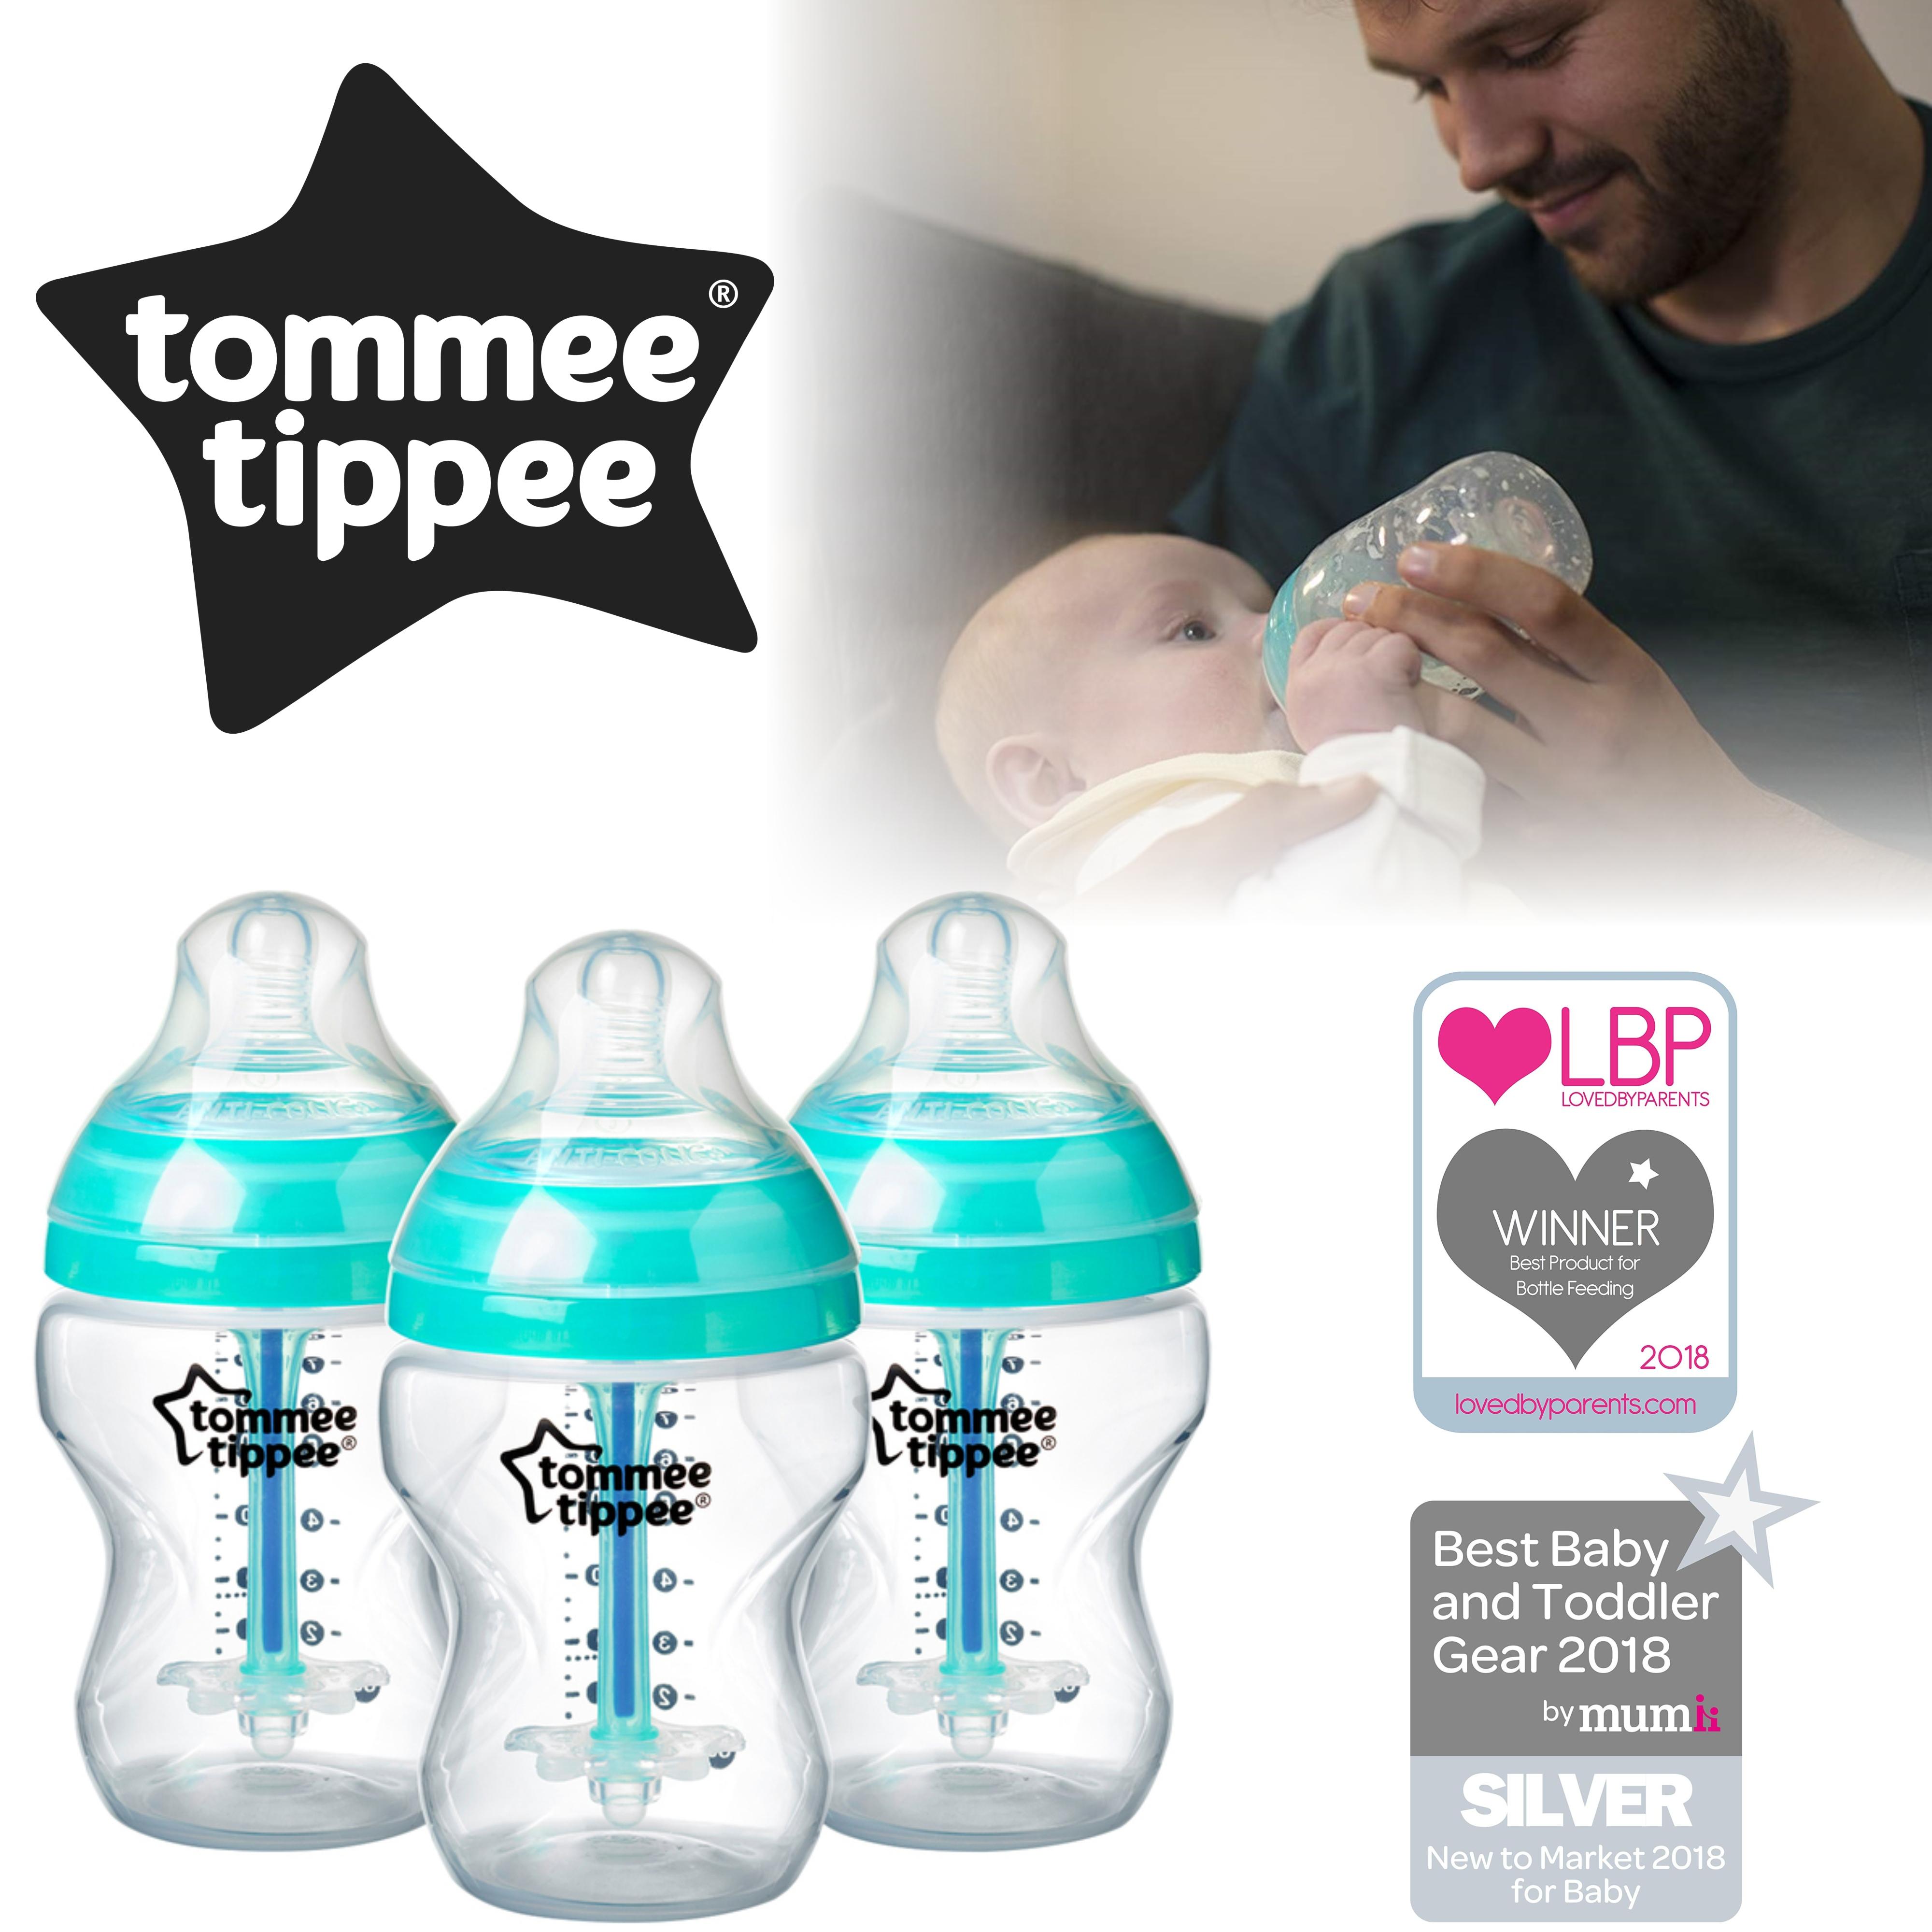 Tommee Tippee Advanced Anti-Colic Baby Feeding Bottle 260ml | Heat Sensing | 3 Pack